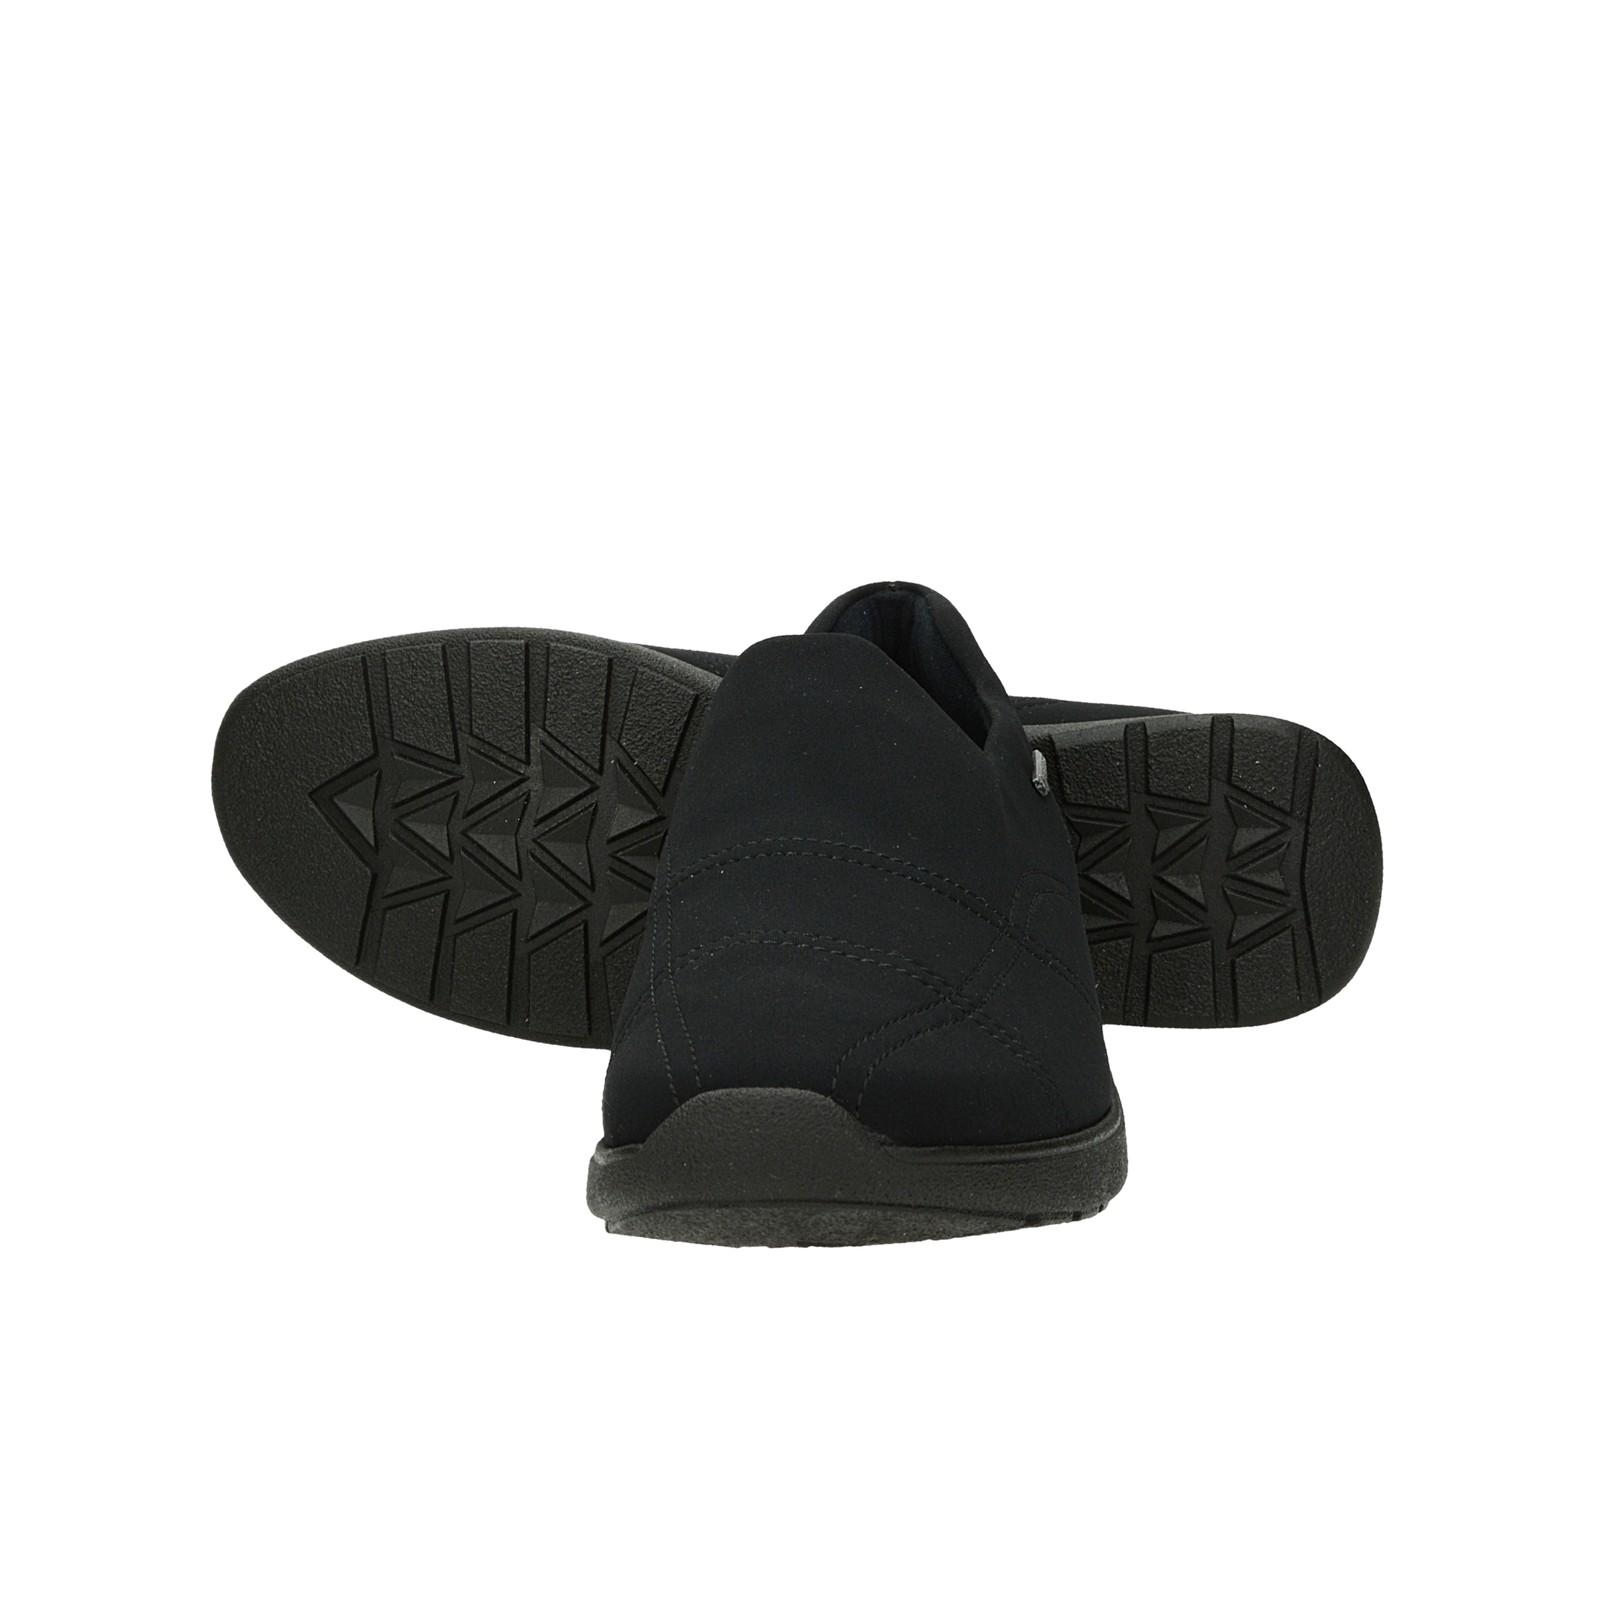 Ara dámske pohodlné tenisky bez šnúrovania - čierne